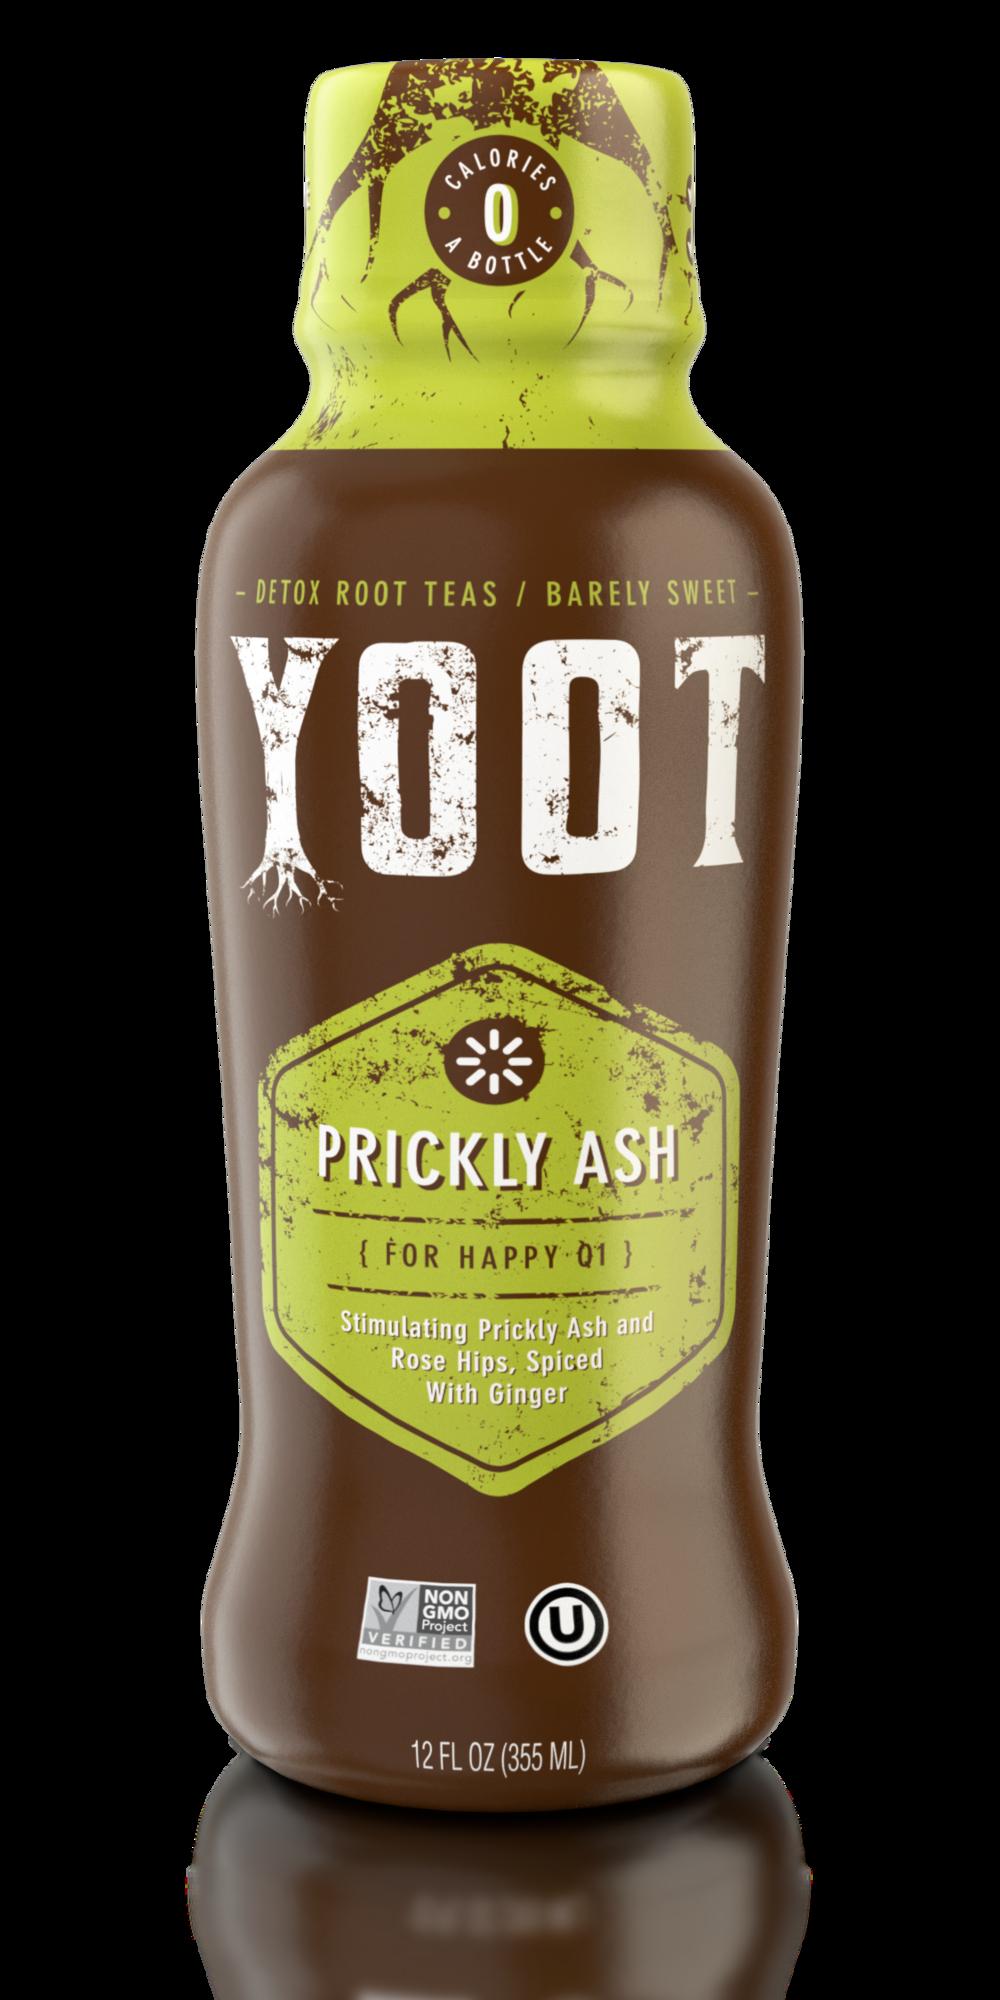 Yoot Prickly Ash Root